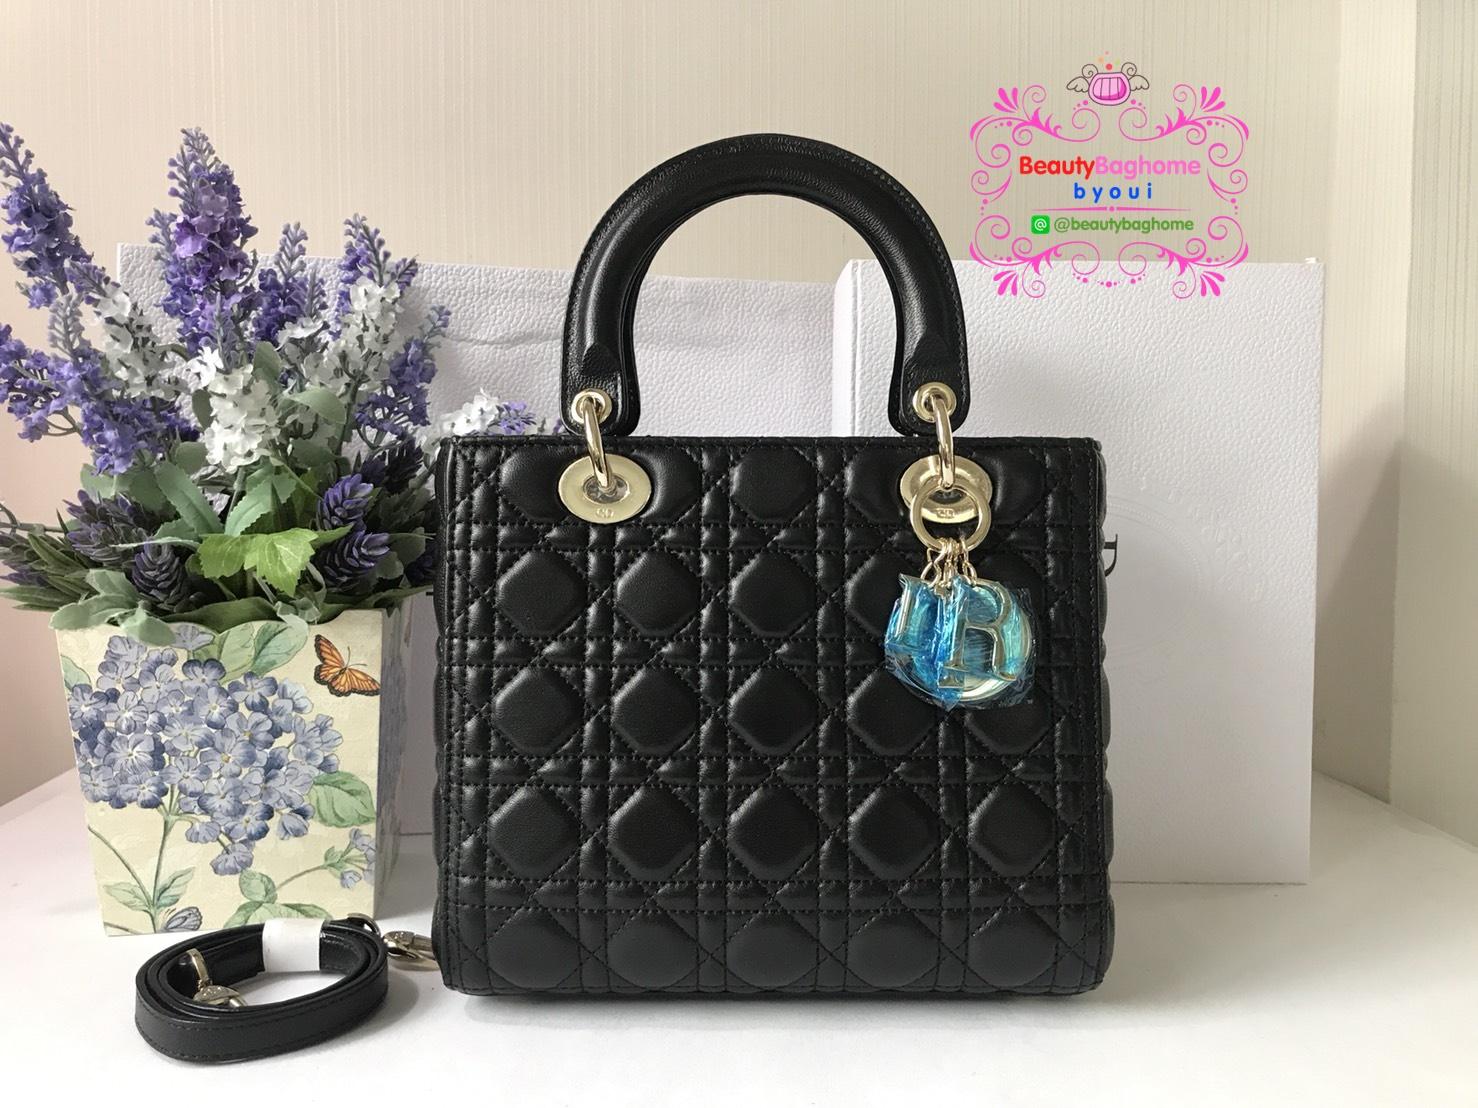 Dior lady สีดำ งานHiend 1:1